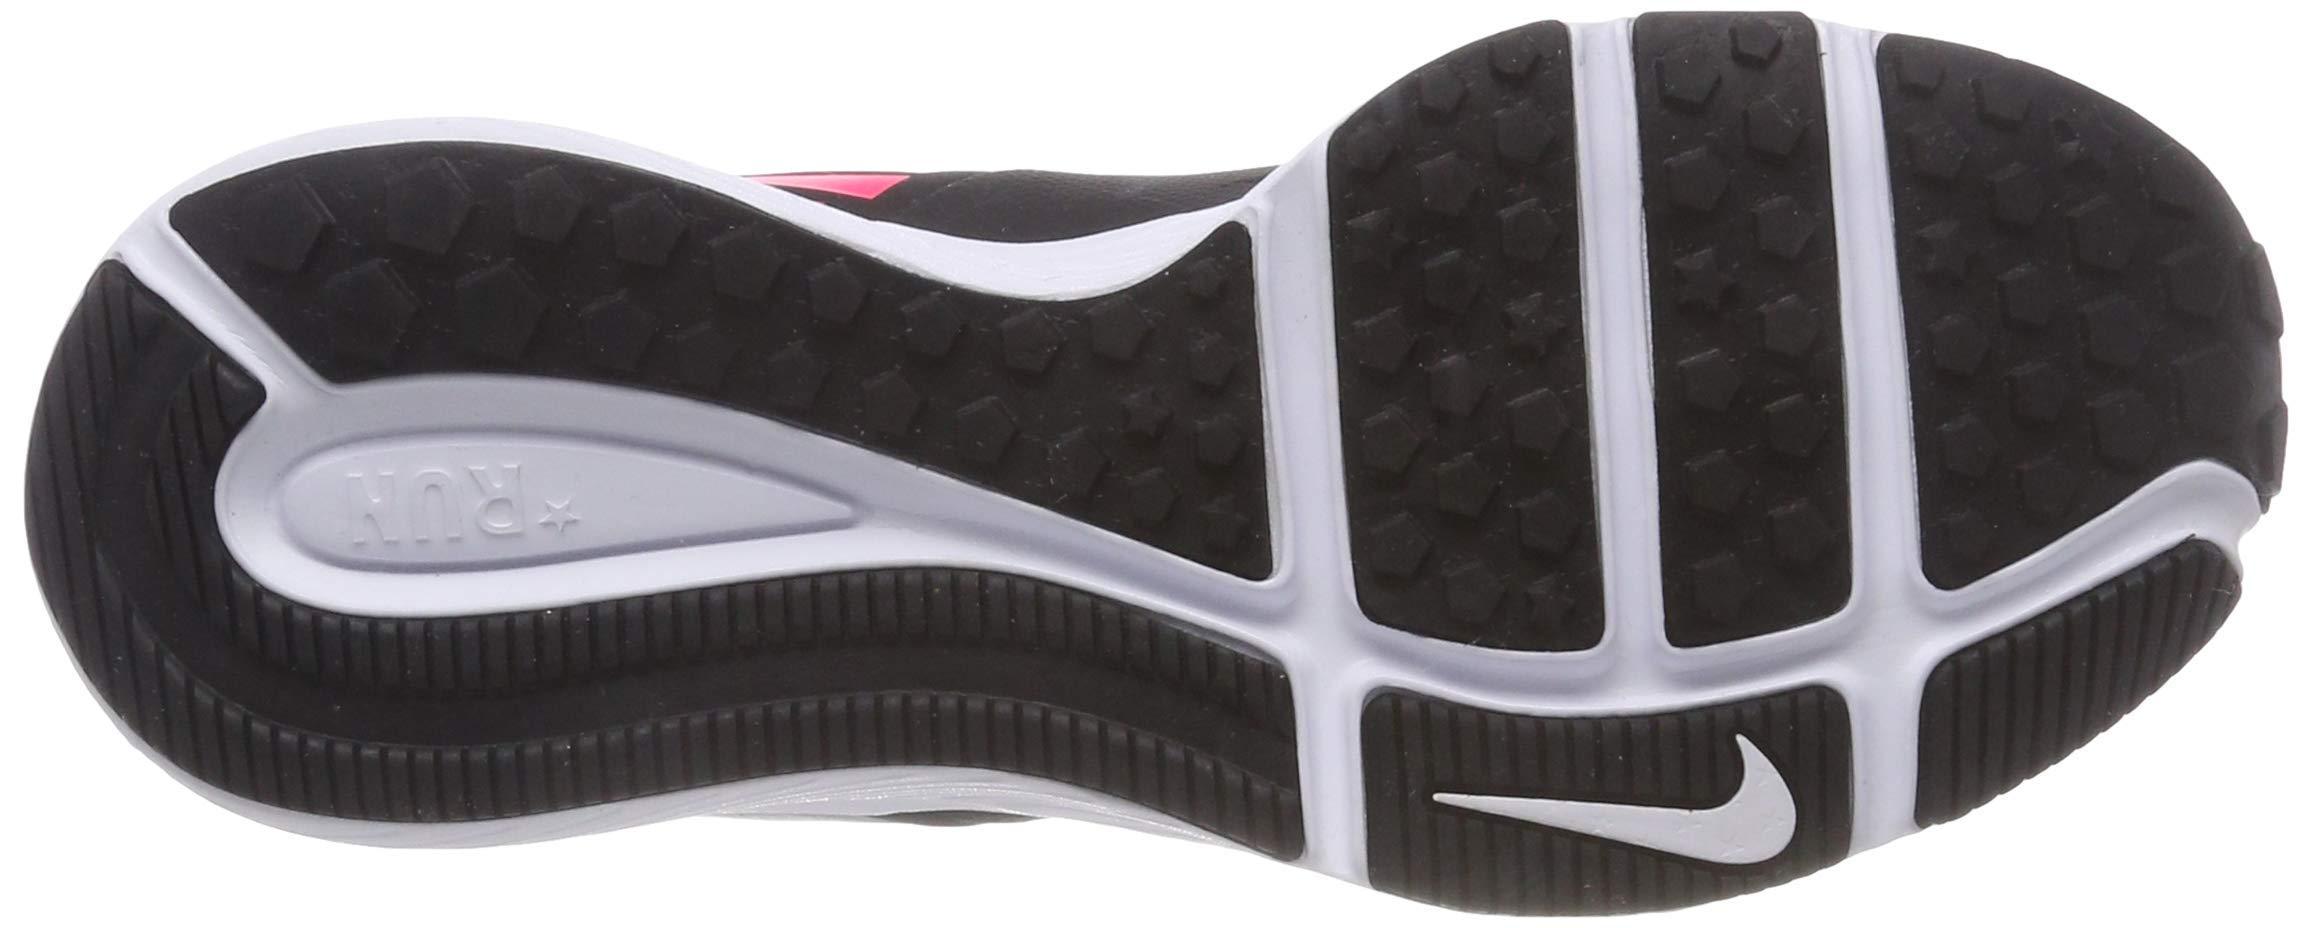 Nike Girl's Star Runner (GS) Running Shoe Black/Metallic Silver/Racer Pink/Volt Size 3.5 M US by Nike (Image #5)